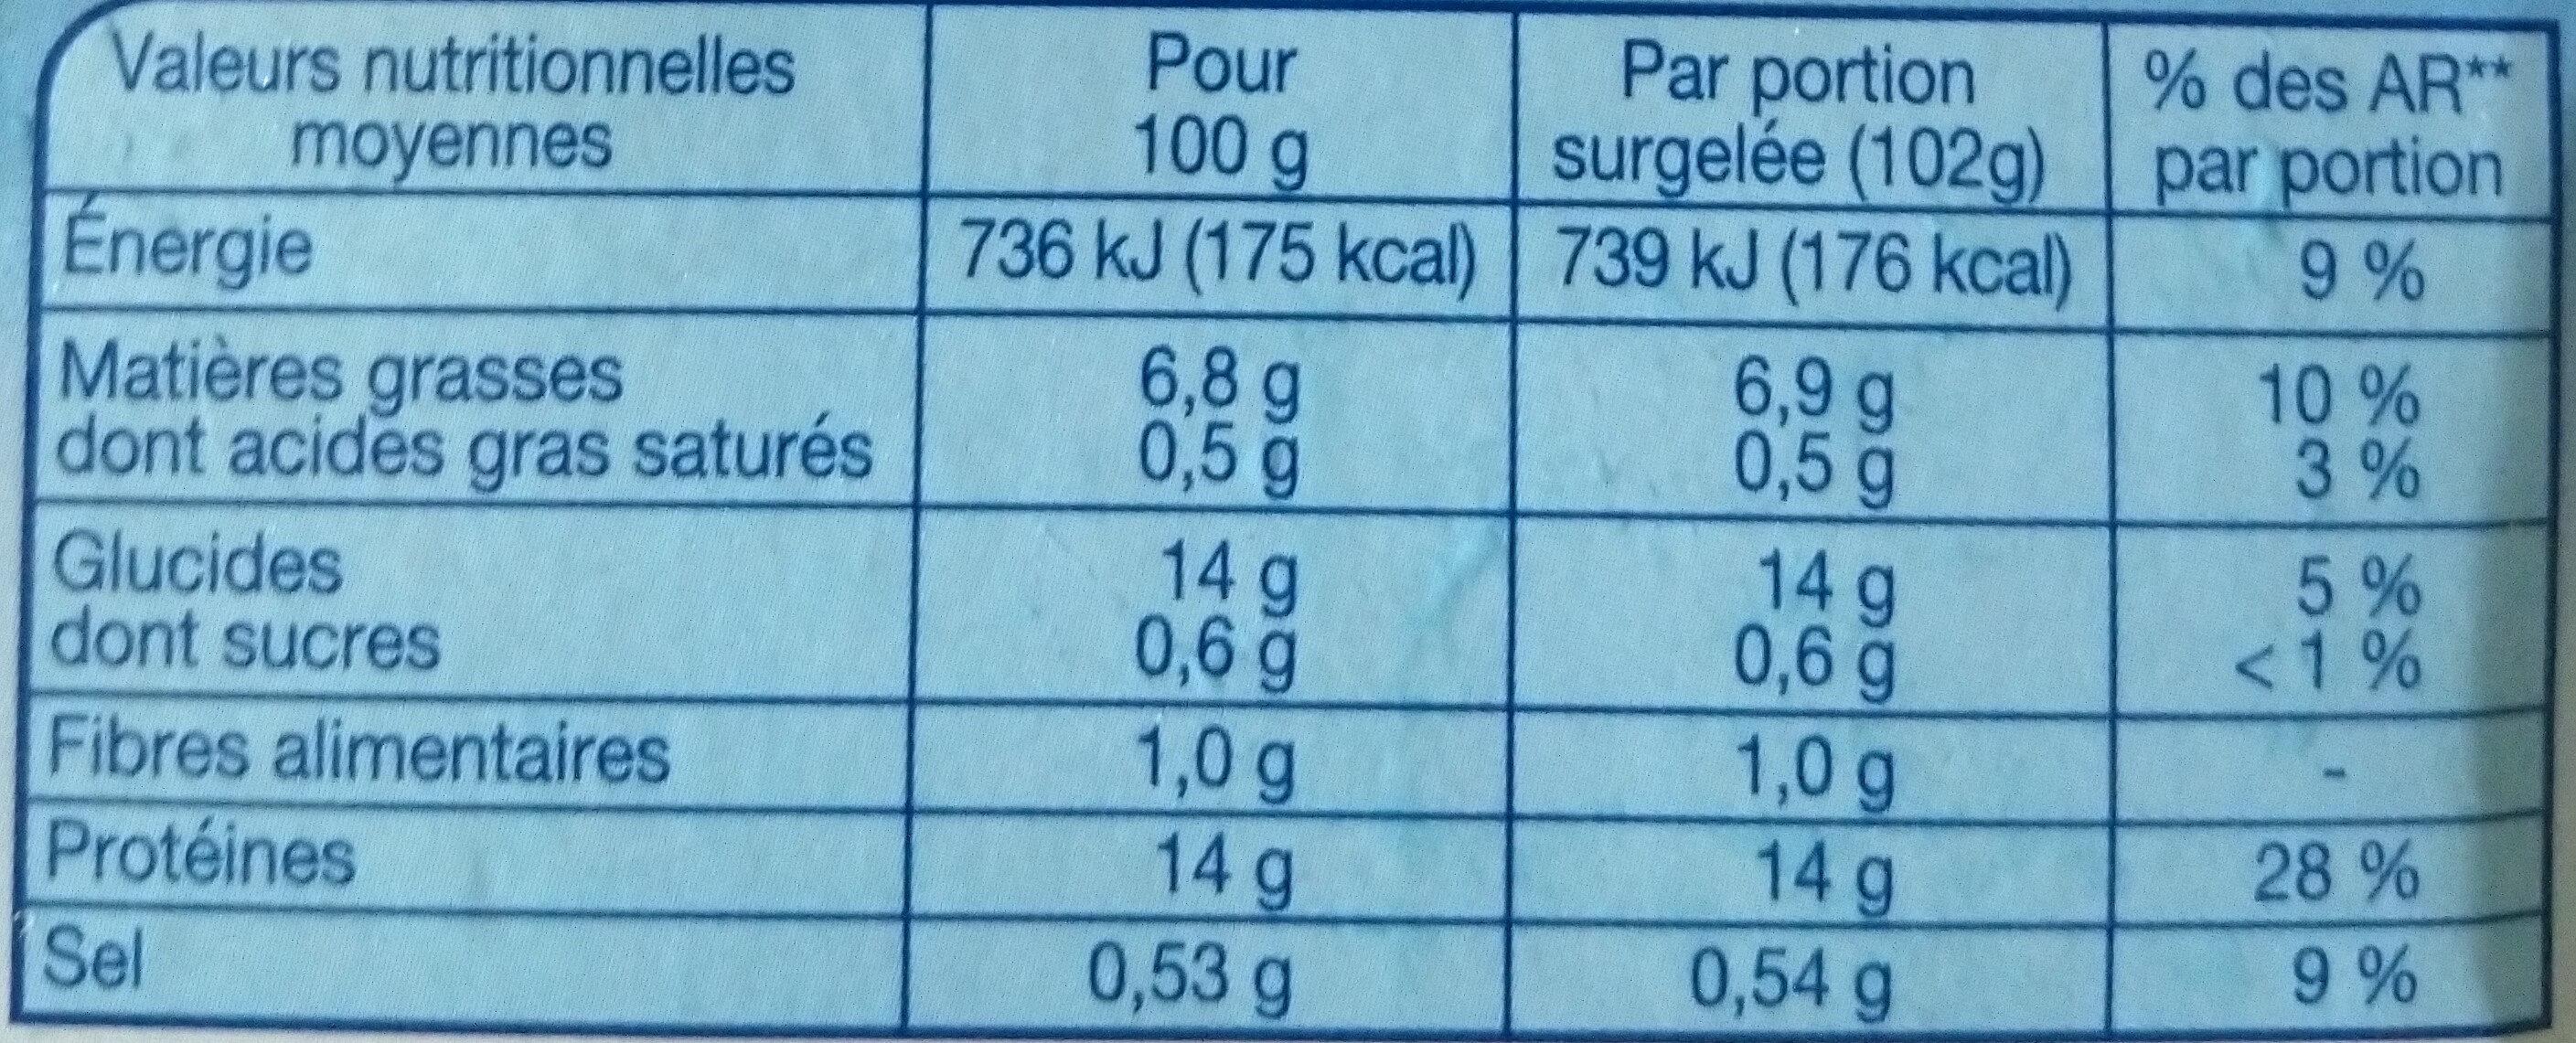 Tranches panées de Cabillaud MSC - Valori nutrizionali - fr